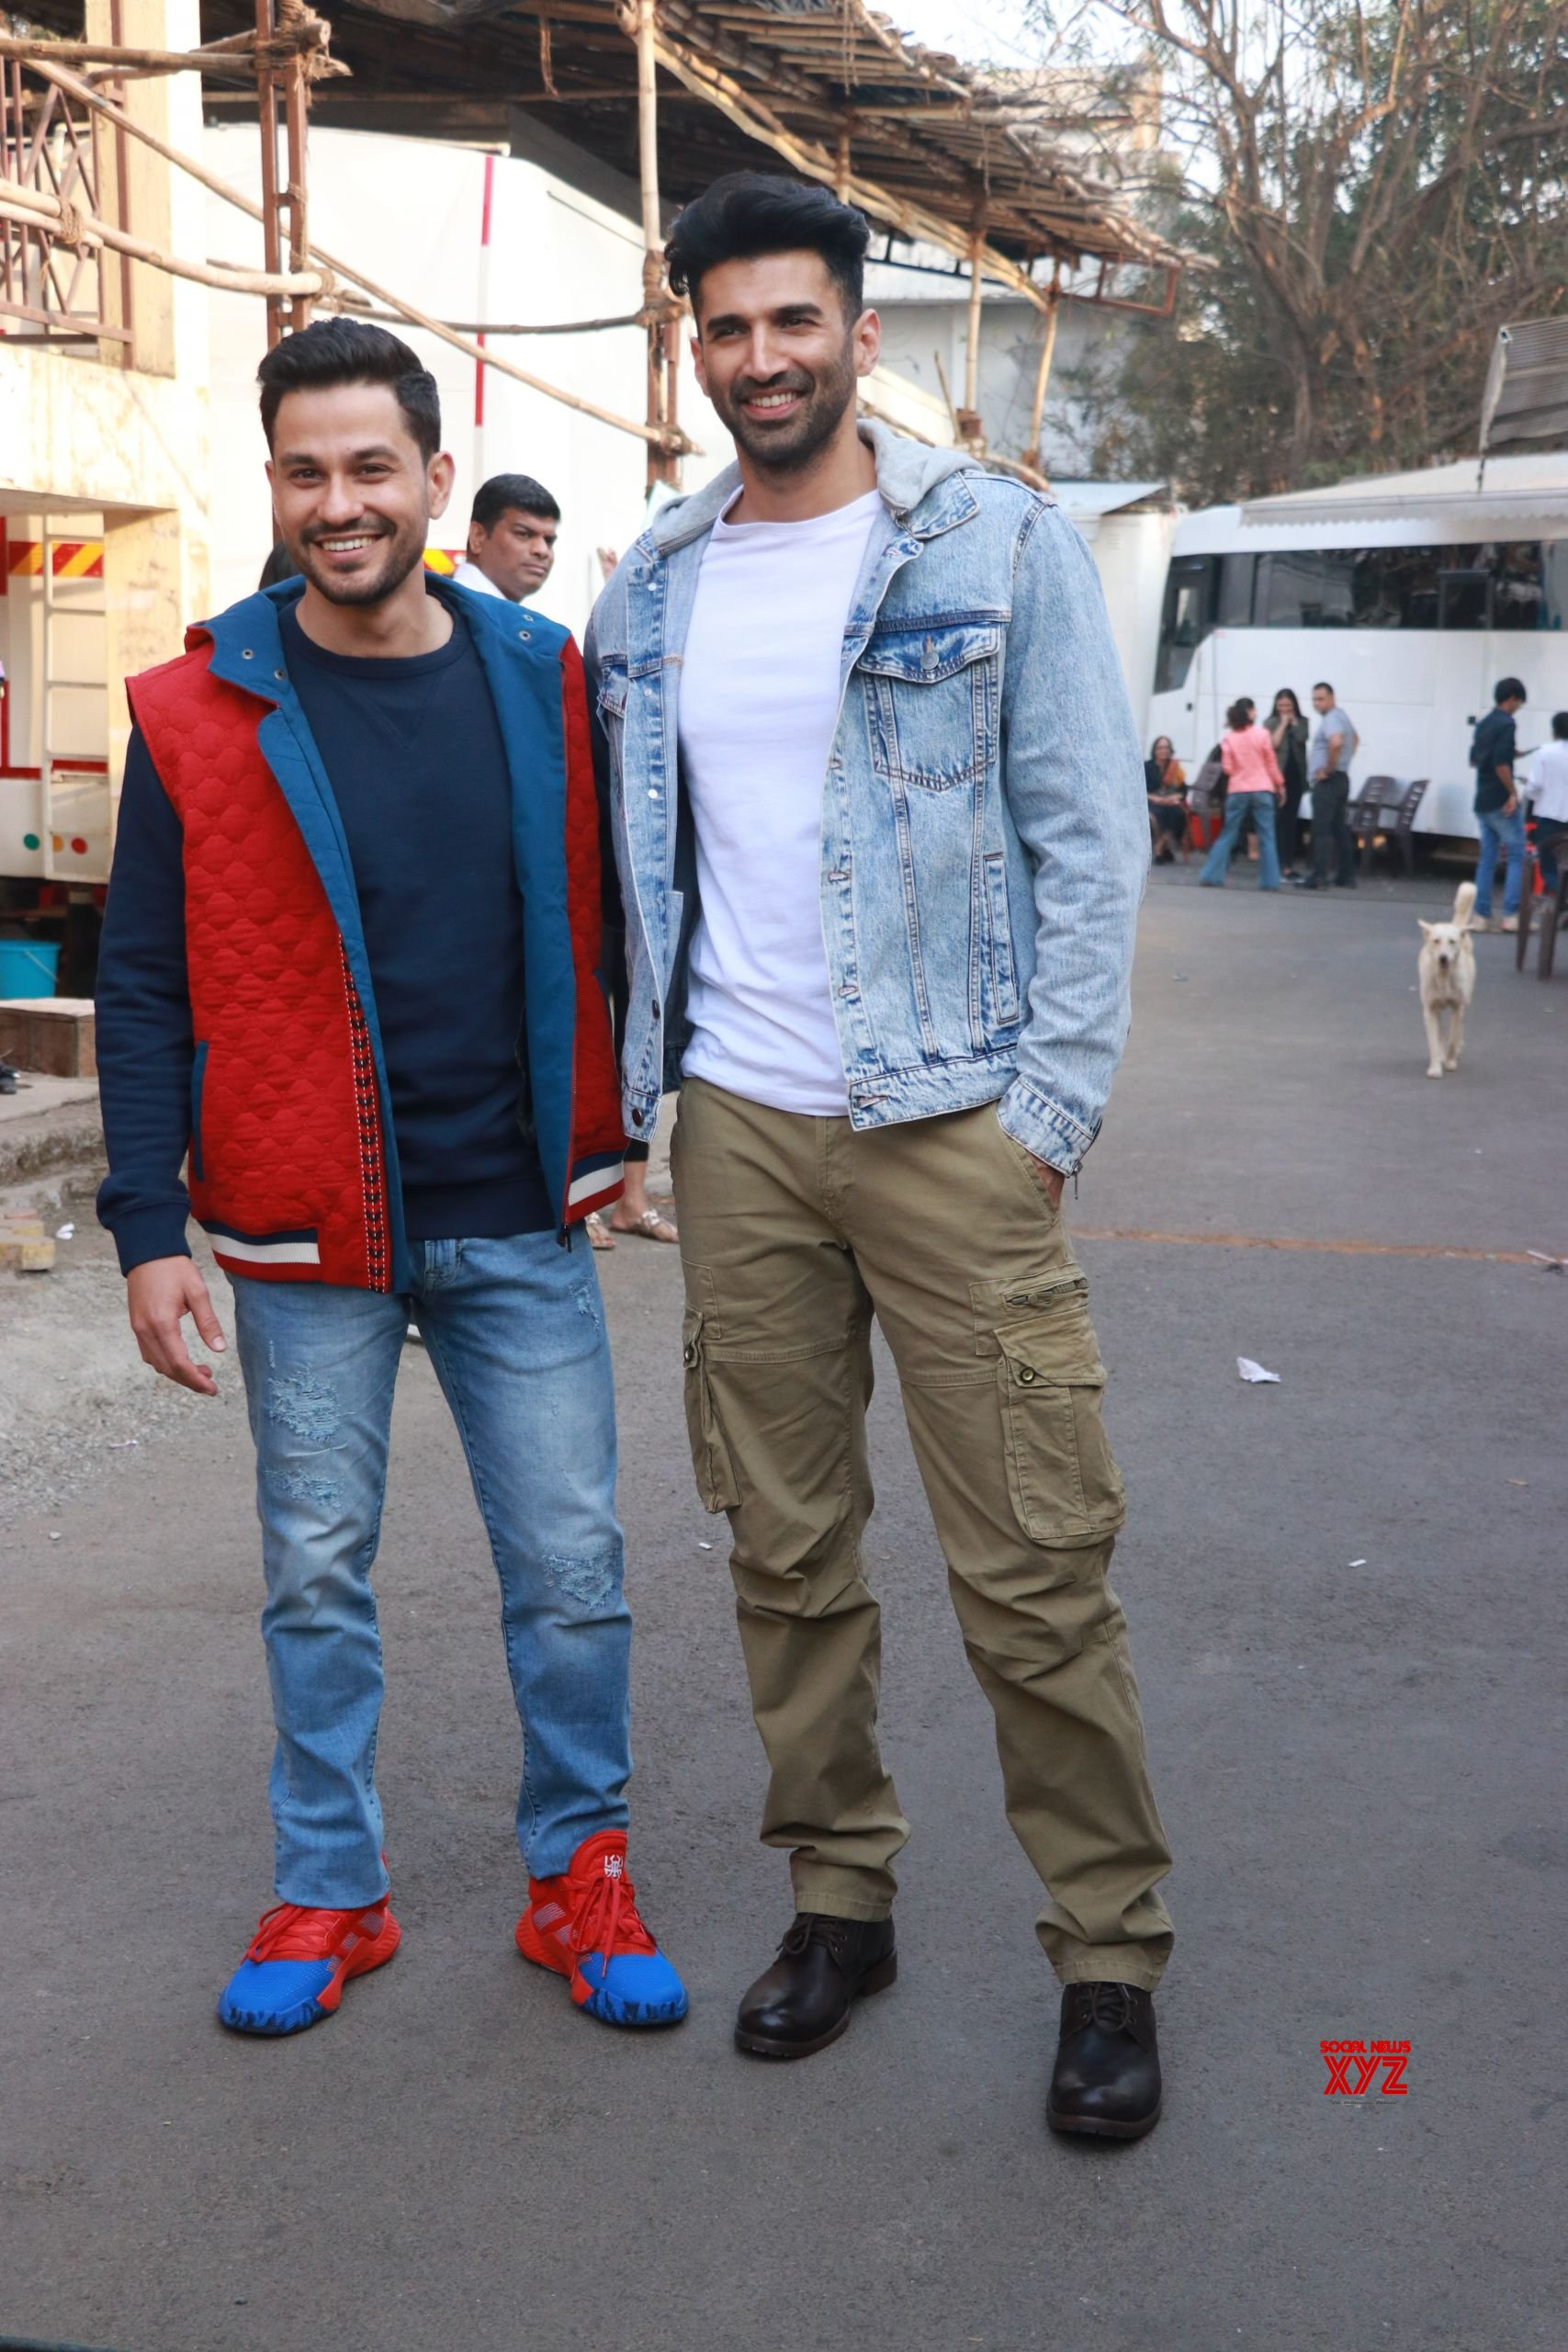 Disha Patani Aditya Roy Kapoor Anil Kapoor And Kunal Khemu On The Sets Of Kapil Sharma S Show To Promote Malang Gallery Social News Xyz